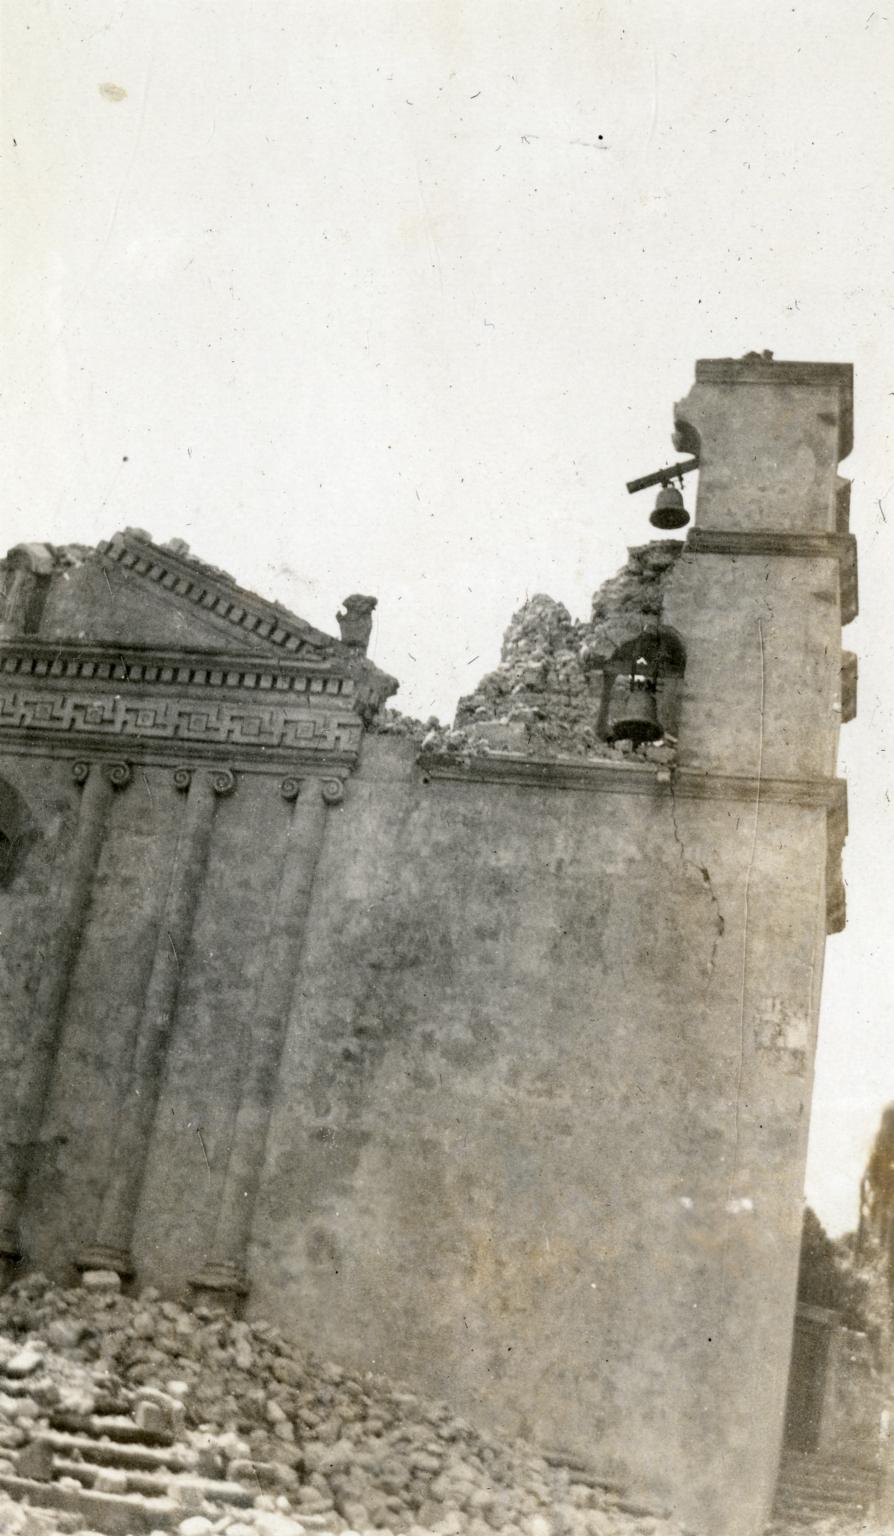 Santa Barbara 1925 Earthquake Damage - Santa Barbara Mission